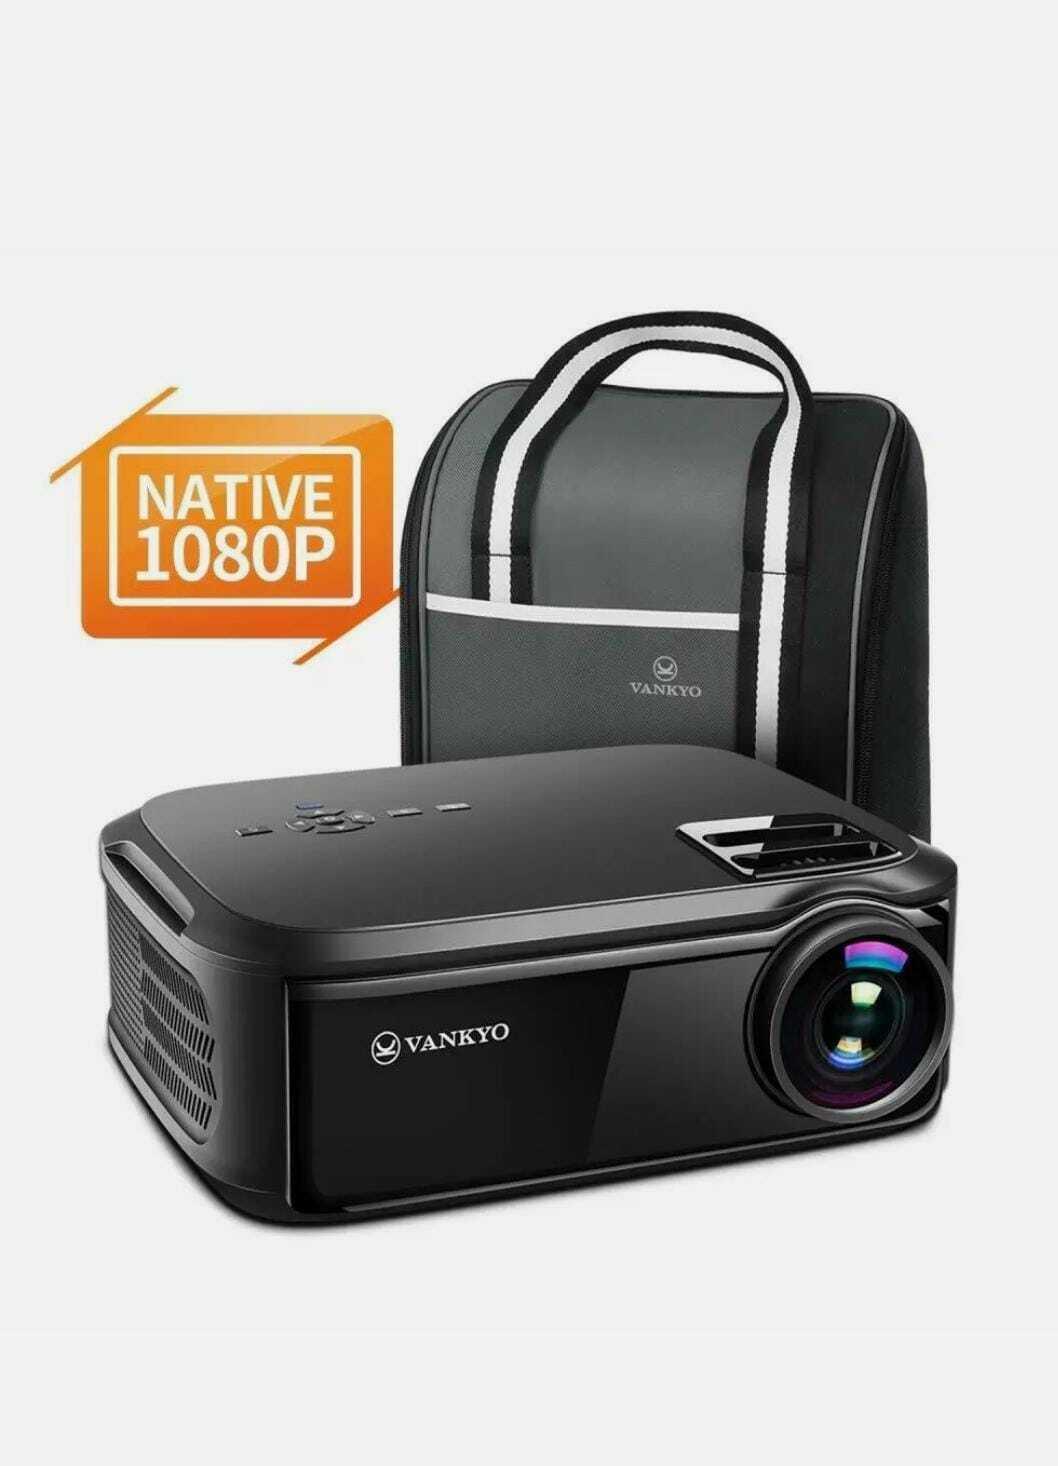 PERFORMANCEV620 saraliso VANKYO Performance V620 220 ANSI 200 Display Full HD 1080p Projector